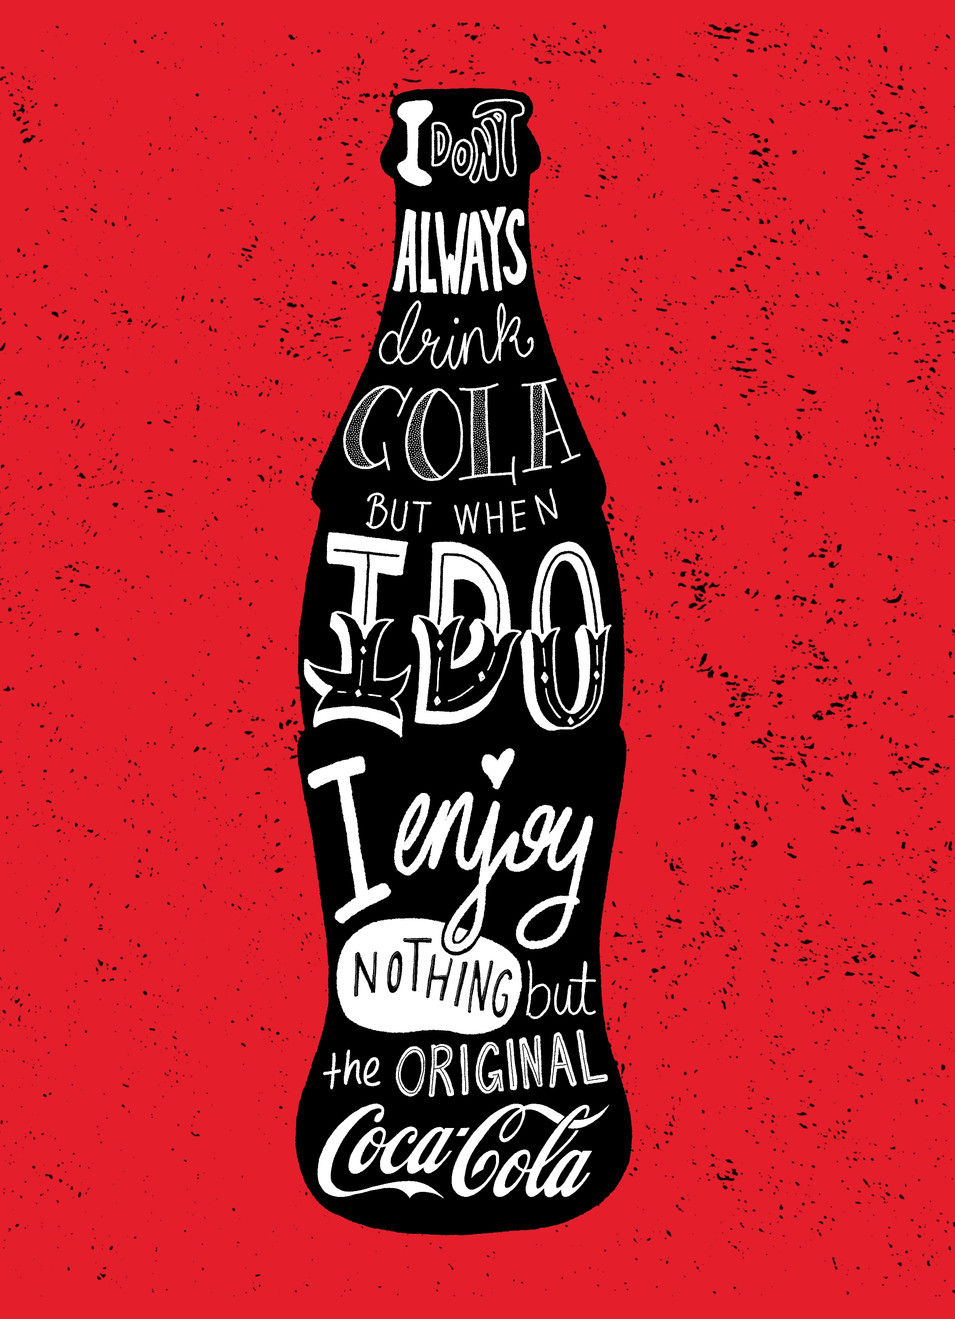 Nothing but the Original Coca Cola